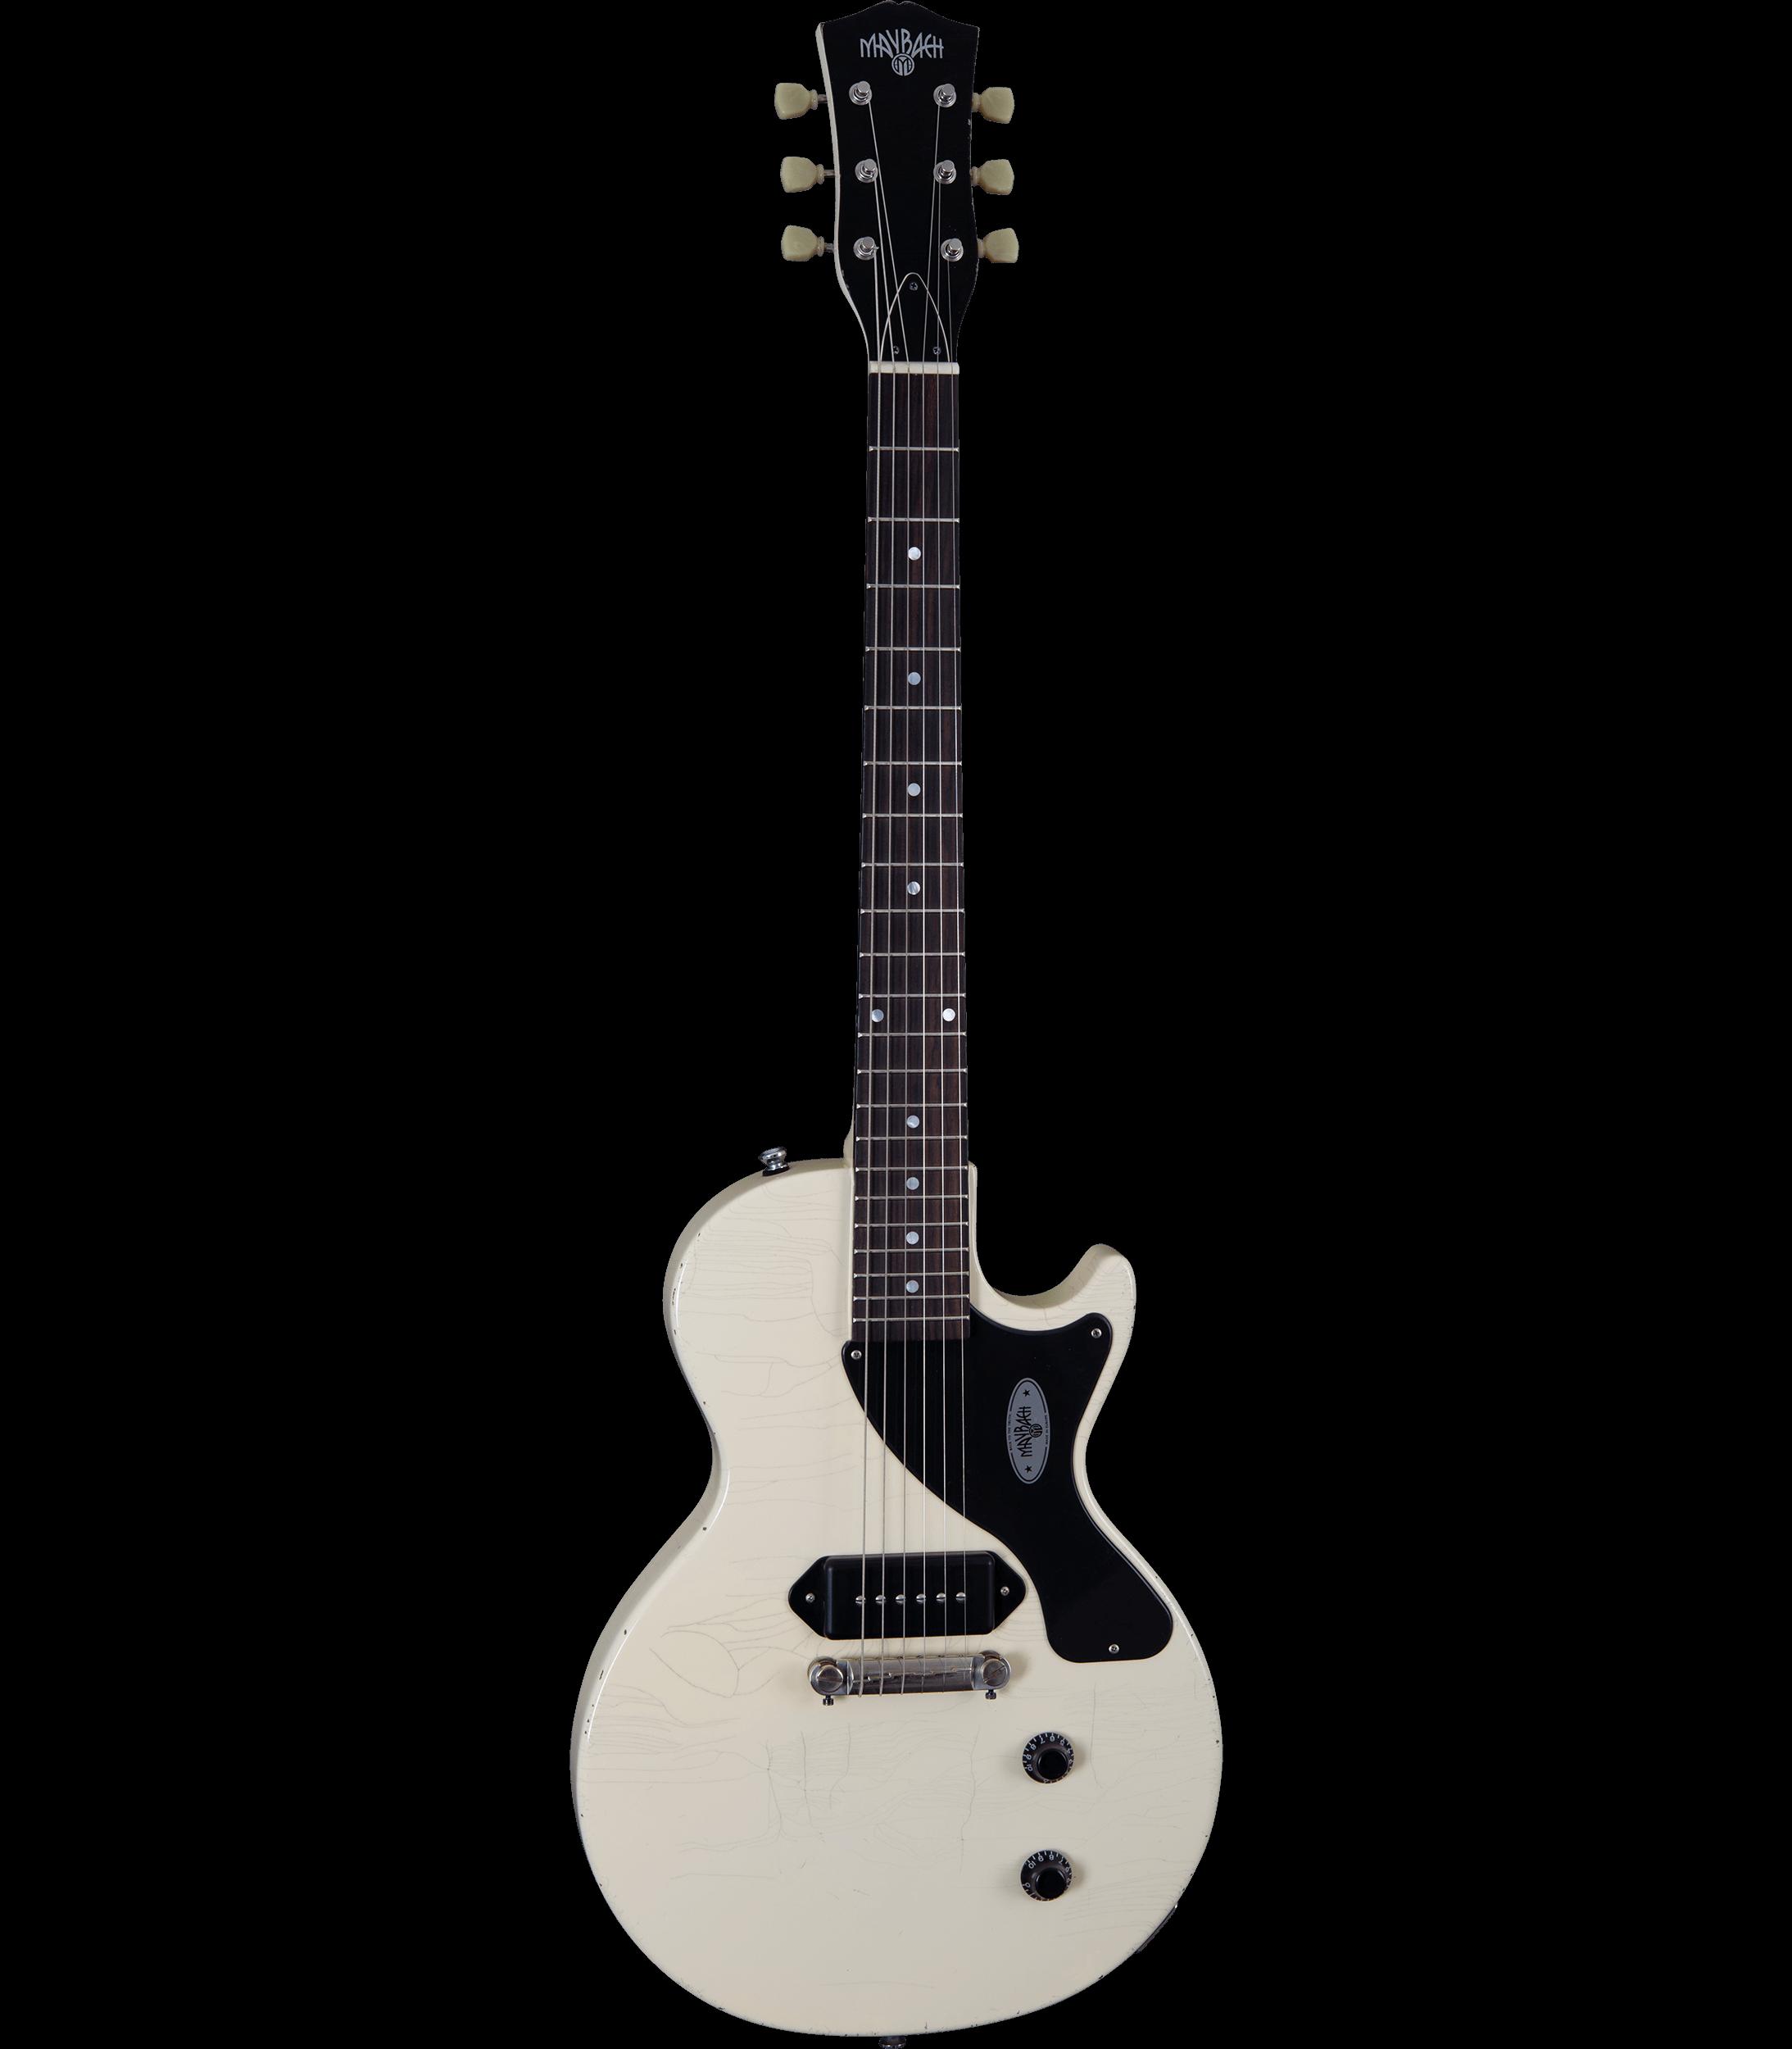 Maybach Lester Jr. Single Cut Vintage White